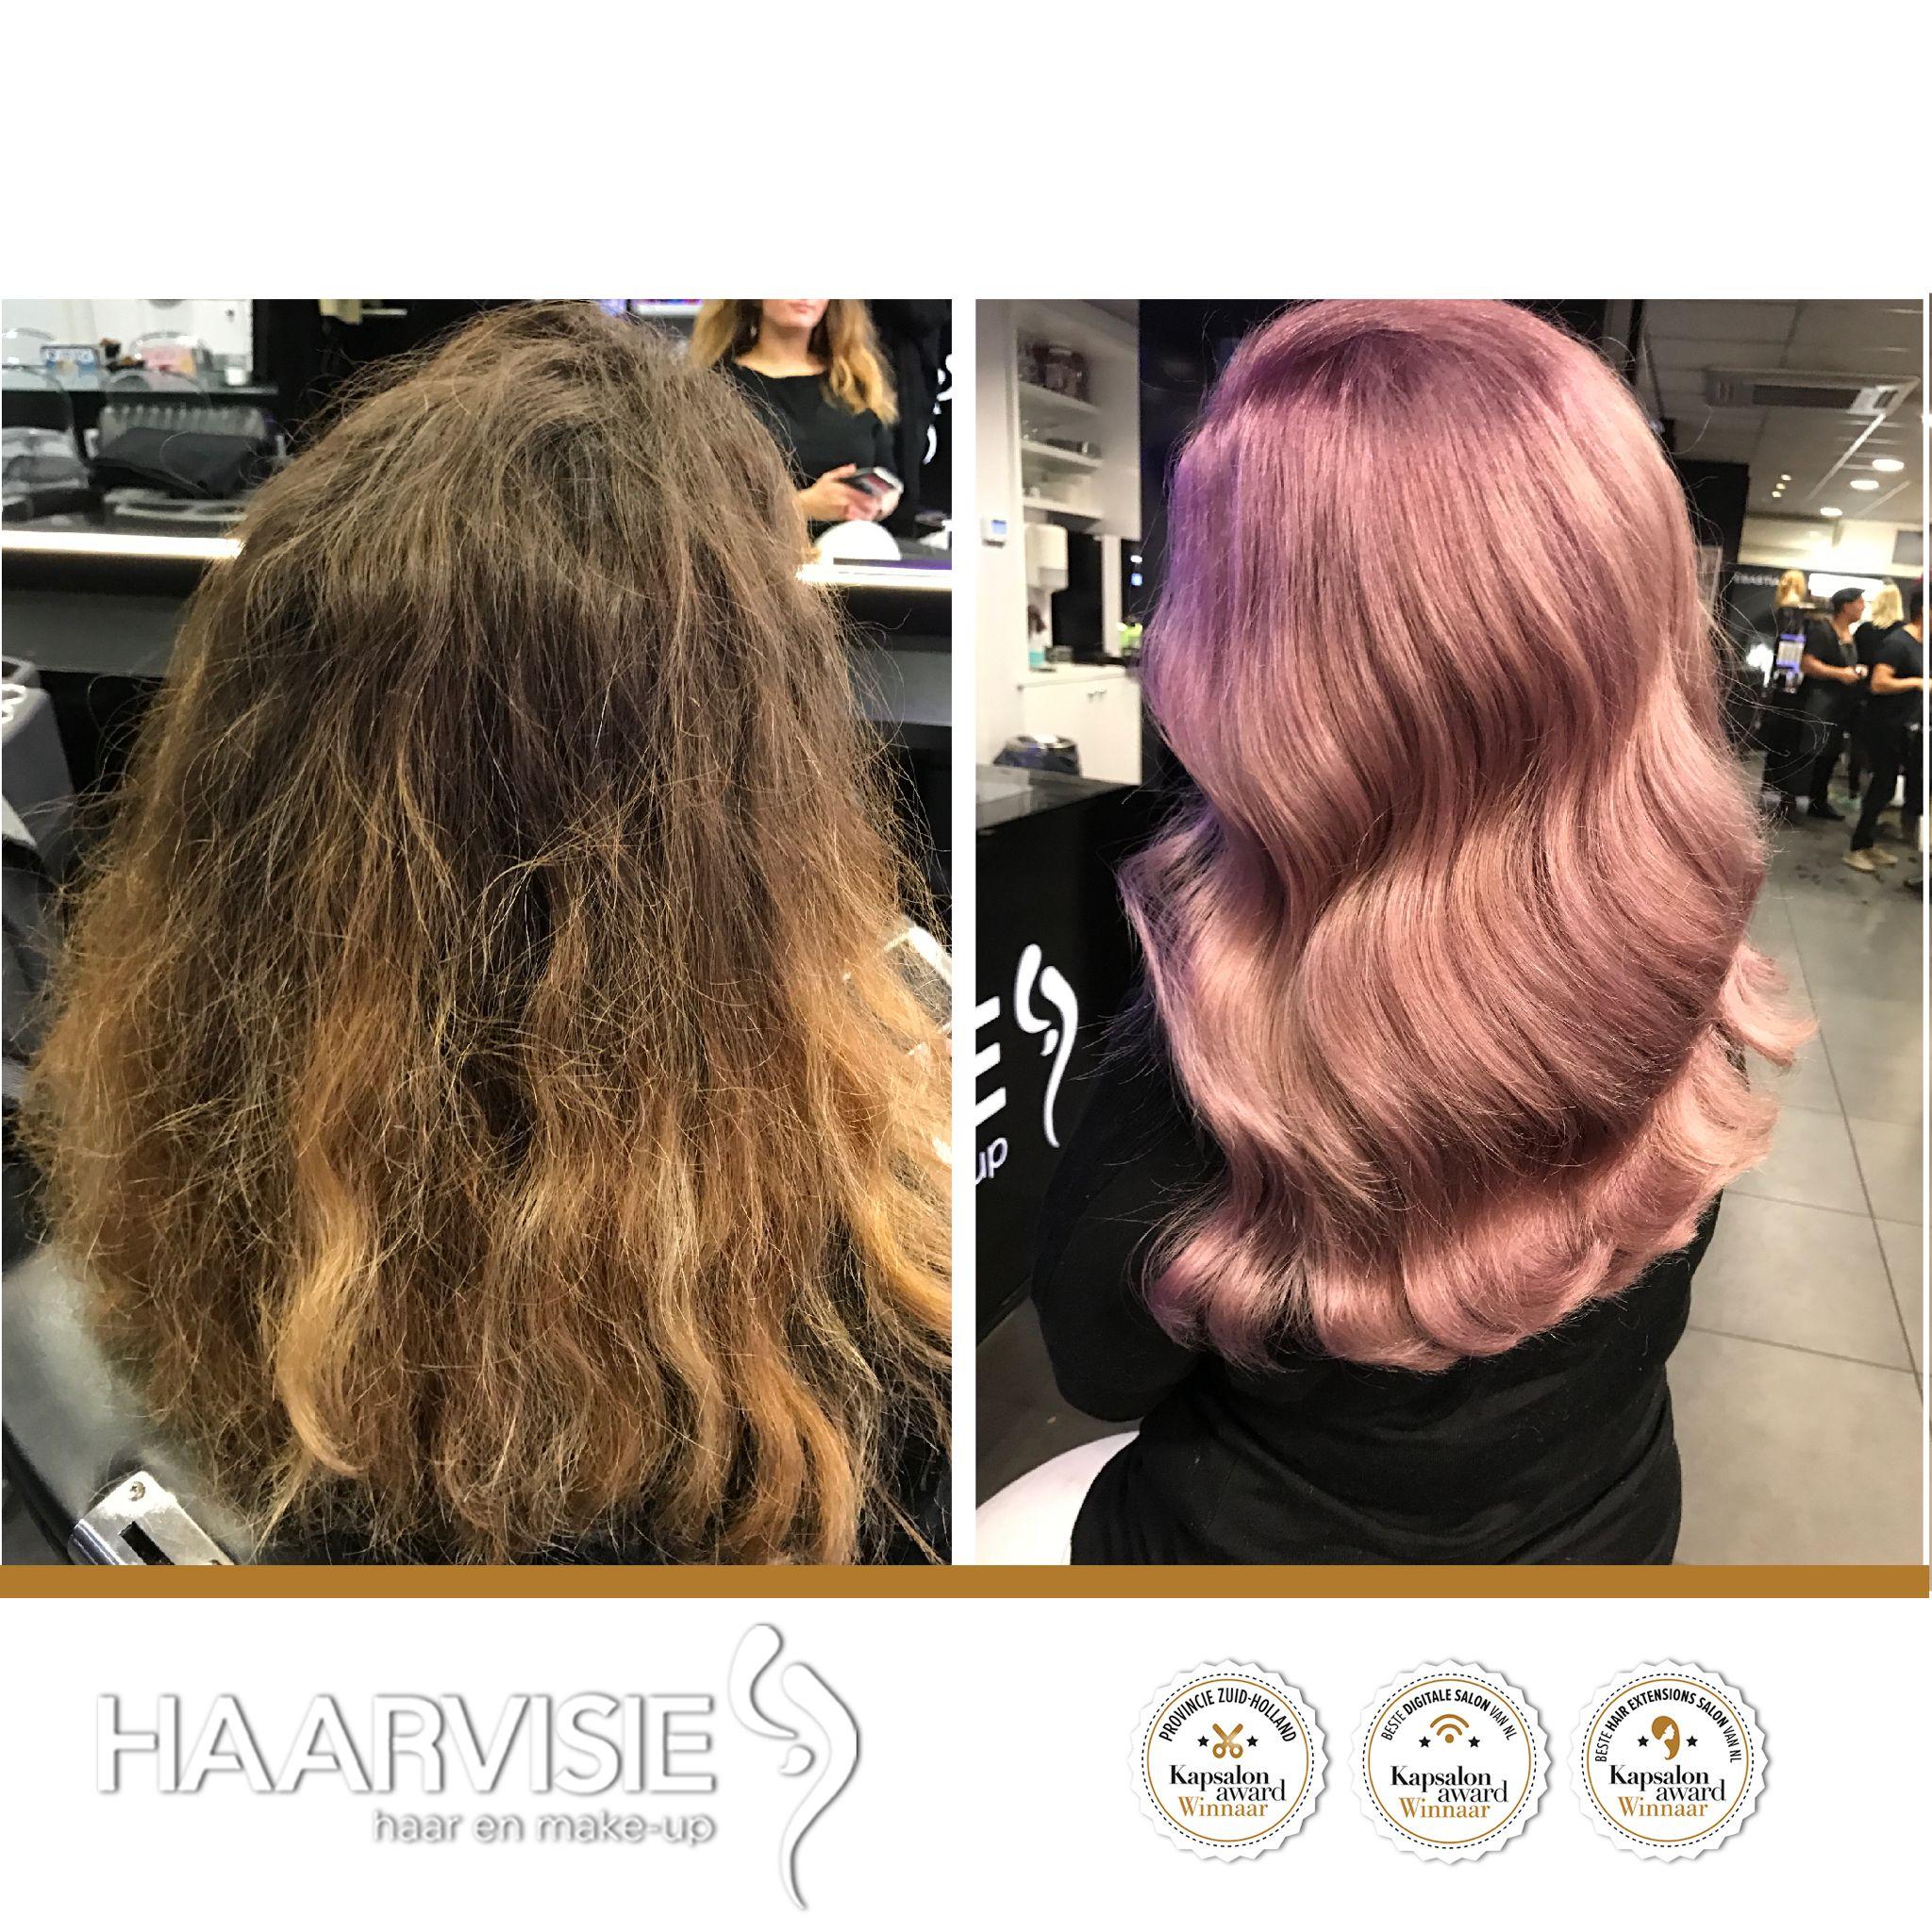 #metamorfose #rosegoldhair #hairgoals #trends #olaplex #haircolor #wella #wellacolor #waves #shine #pastelcolors #creative #hairstyles #hairstyles2017 #haarvisie #haarvisierijswijk